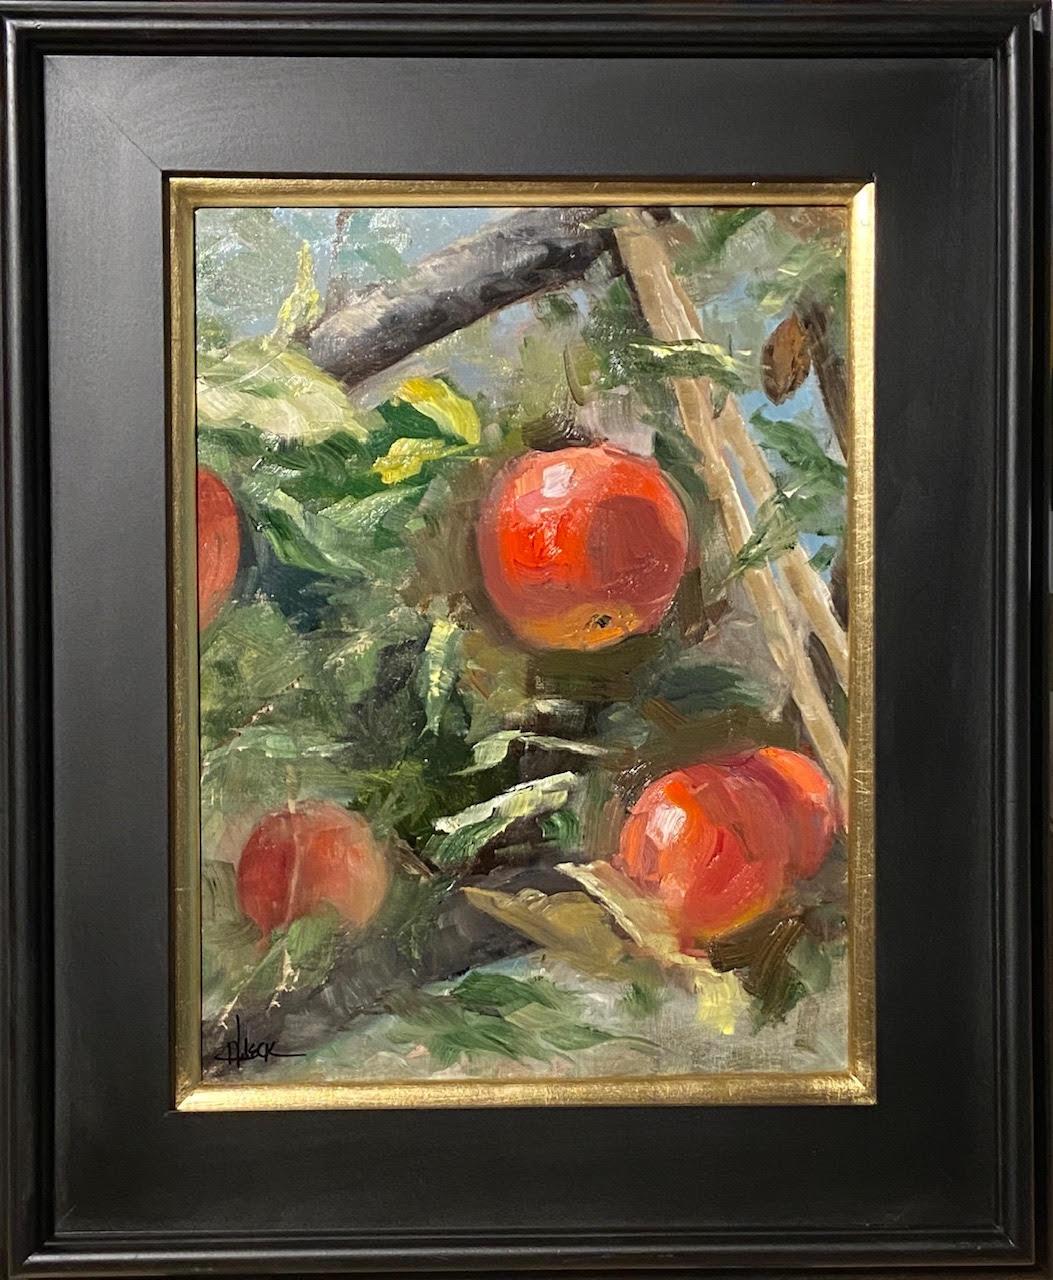 206 - Apple Splendor - 16x12 - Landscape - $480